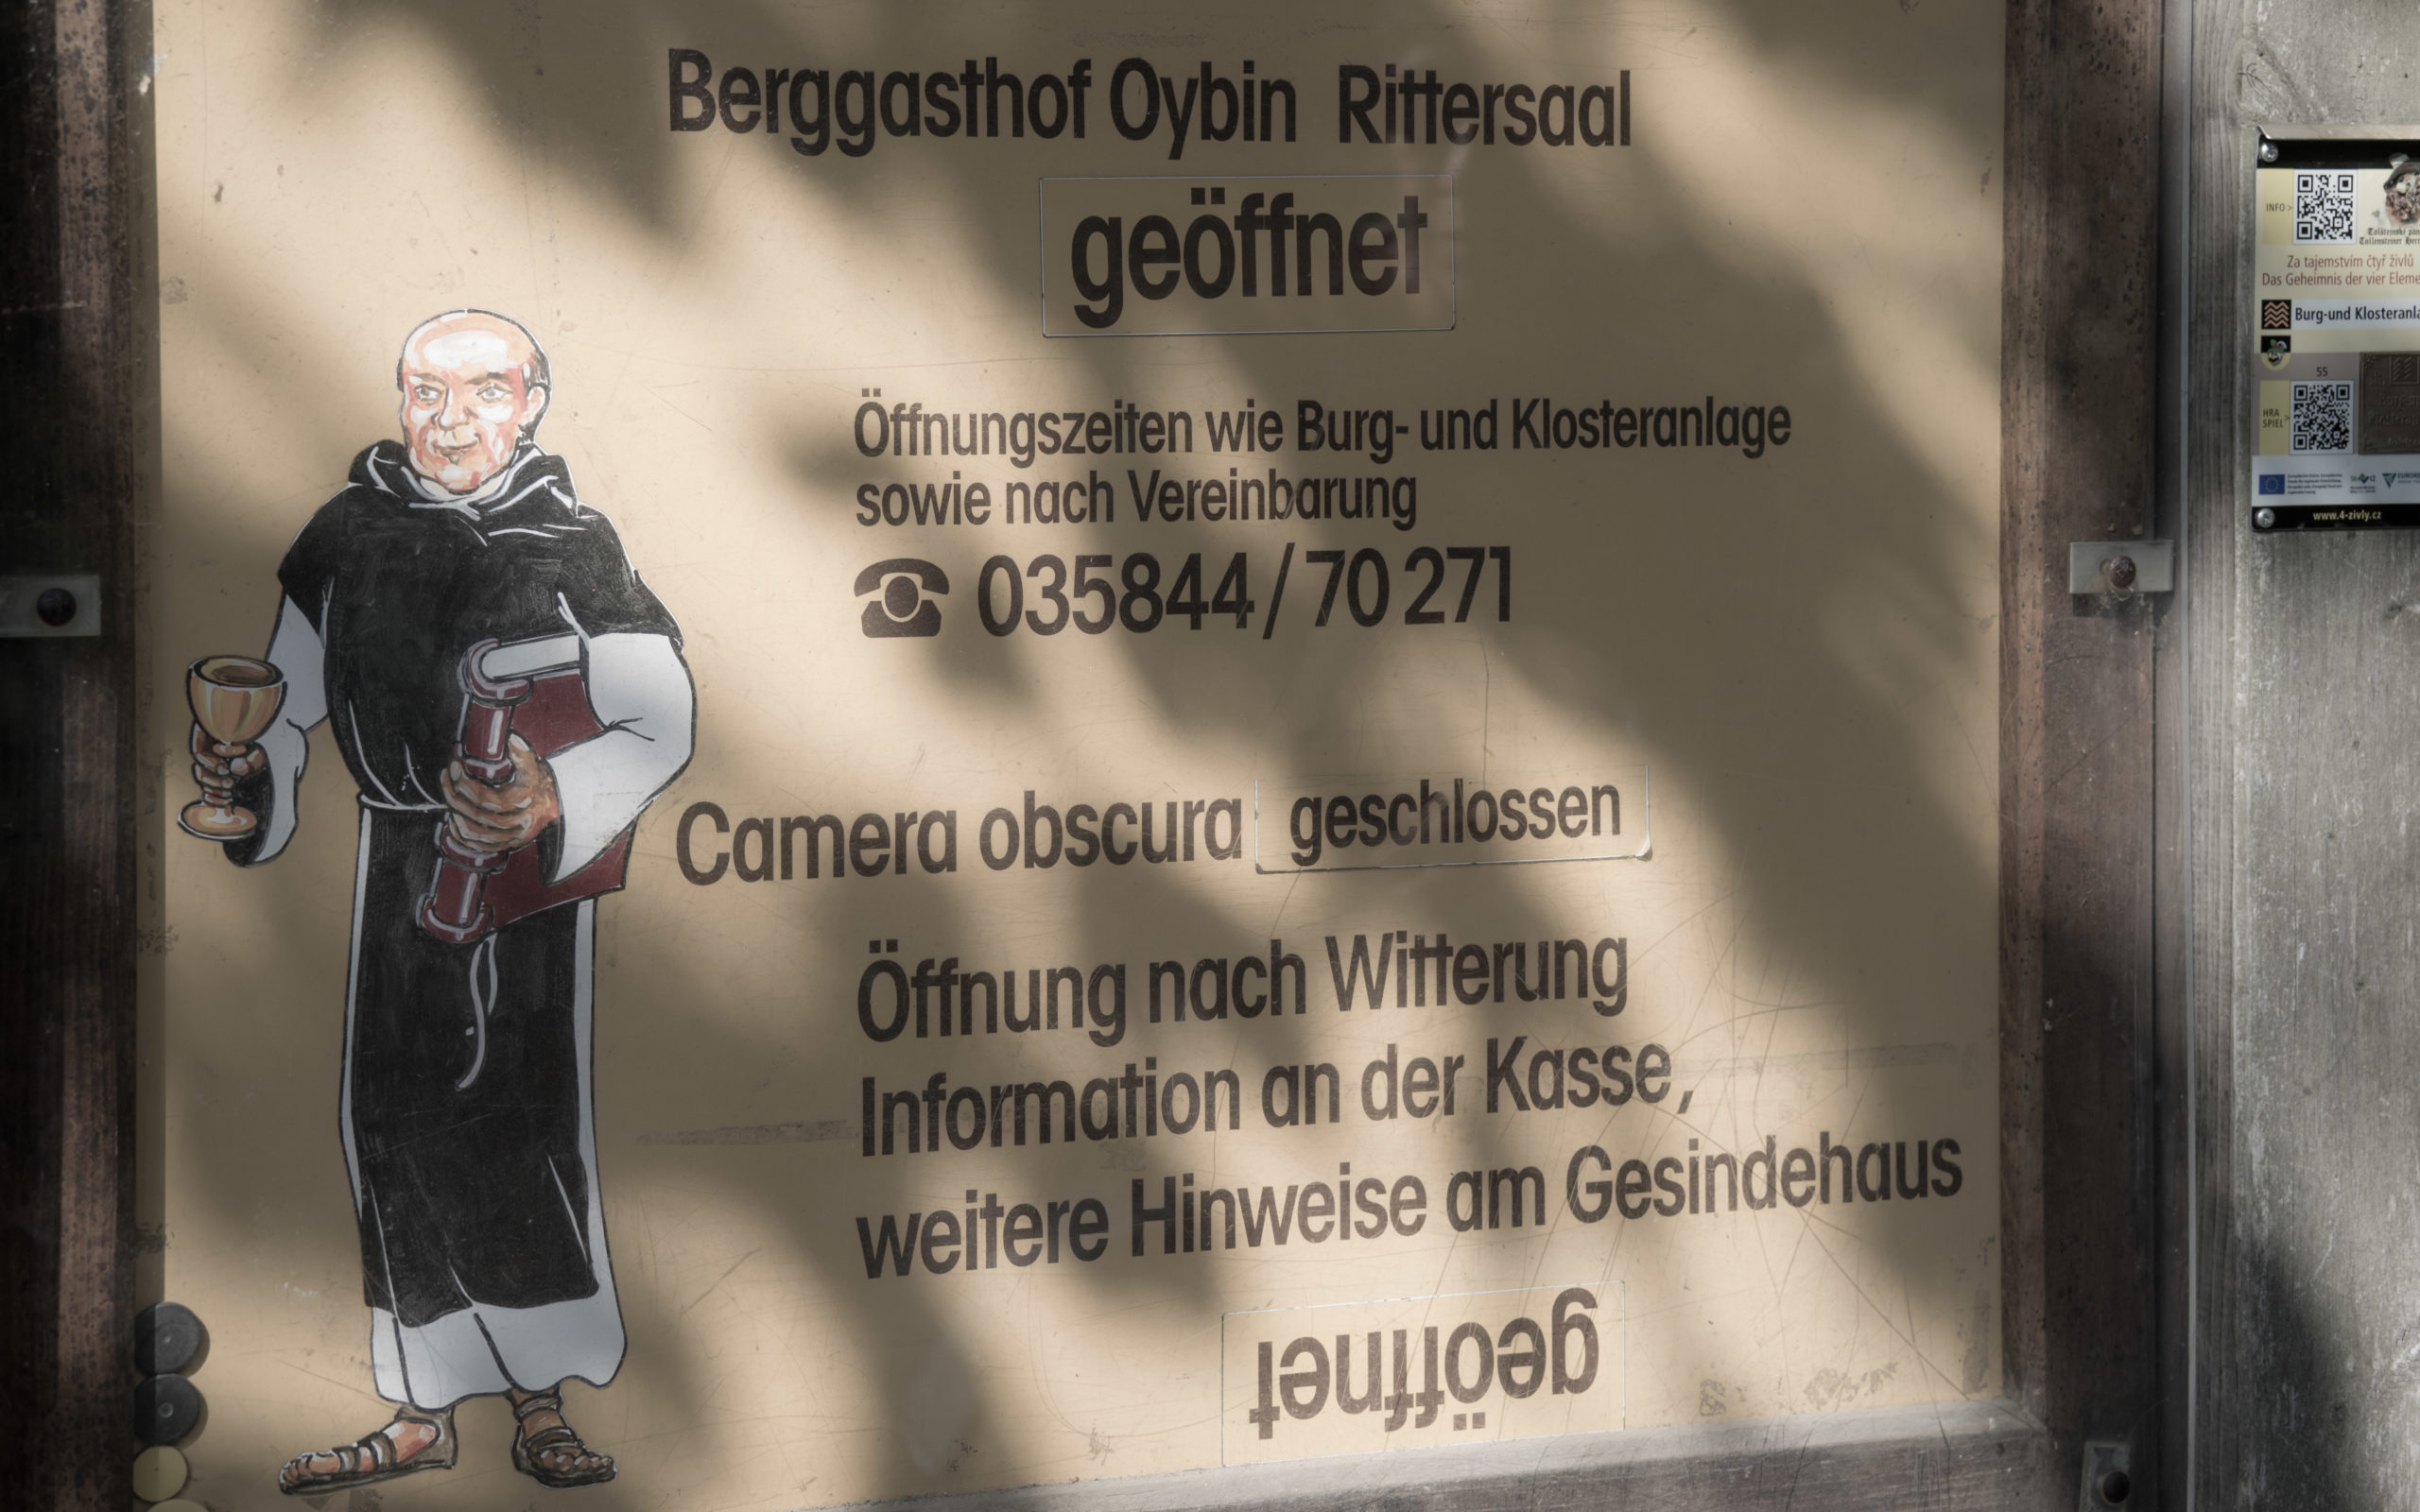 Burg Oybin, Zittauer Gebirge